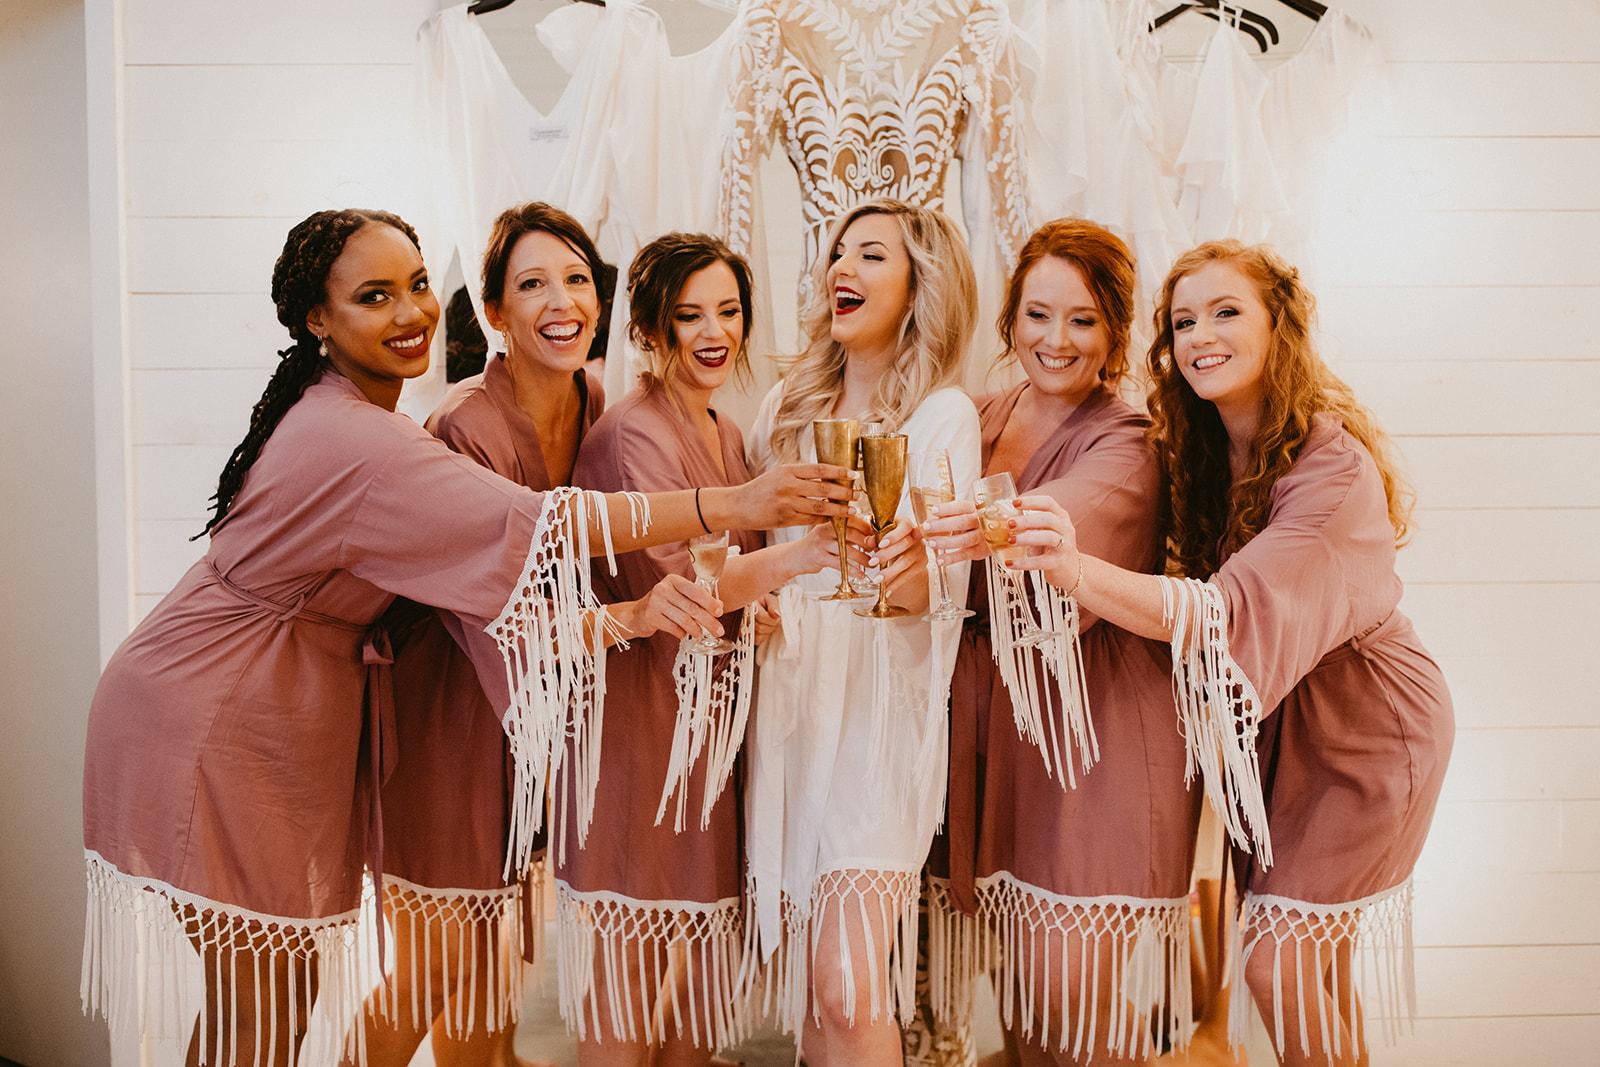 bridesmaids getting ready pictures + boho fringe robes + vintage + boho + wedding day